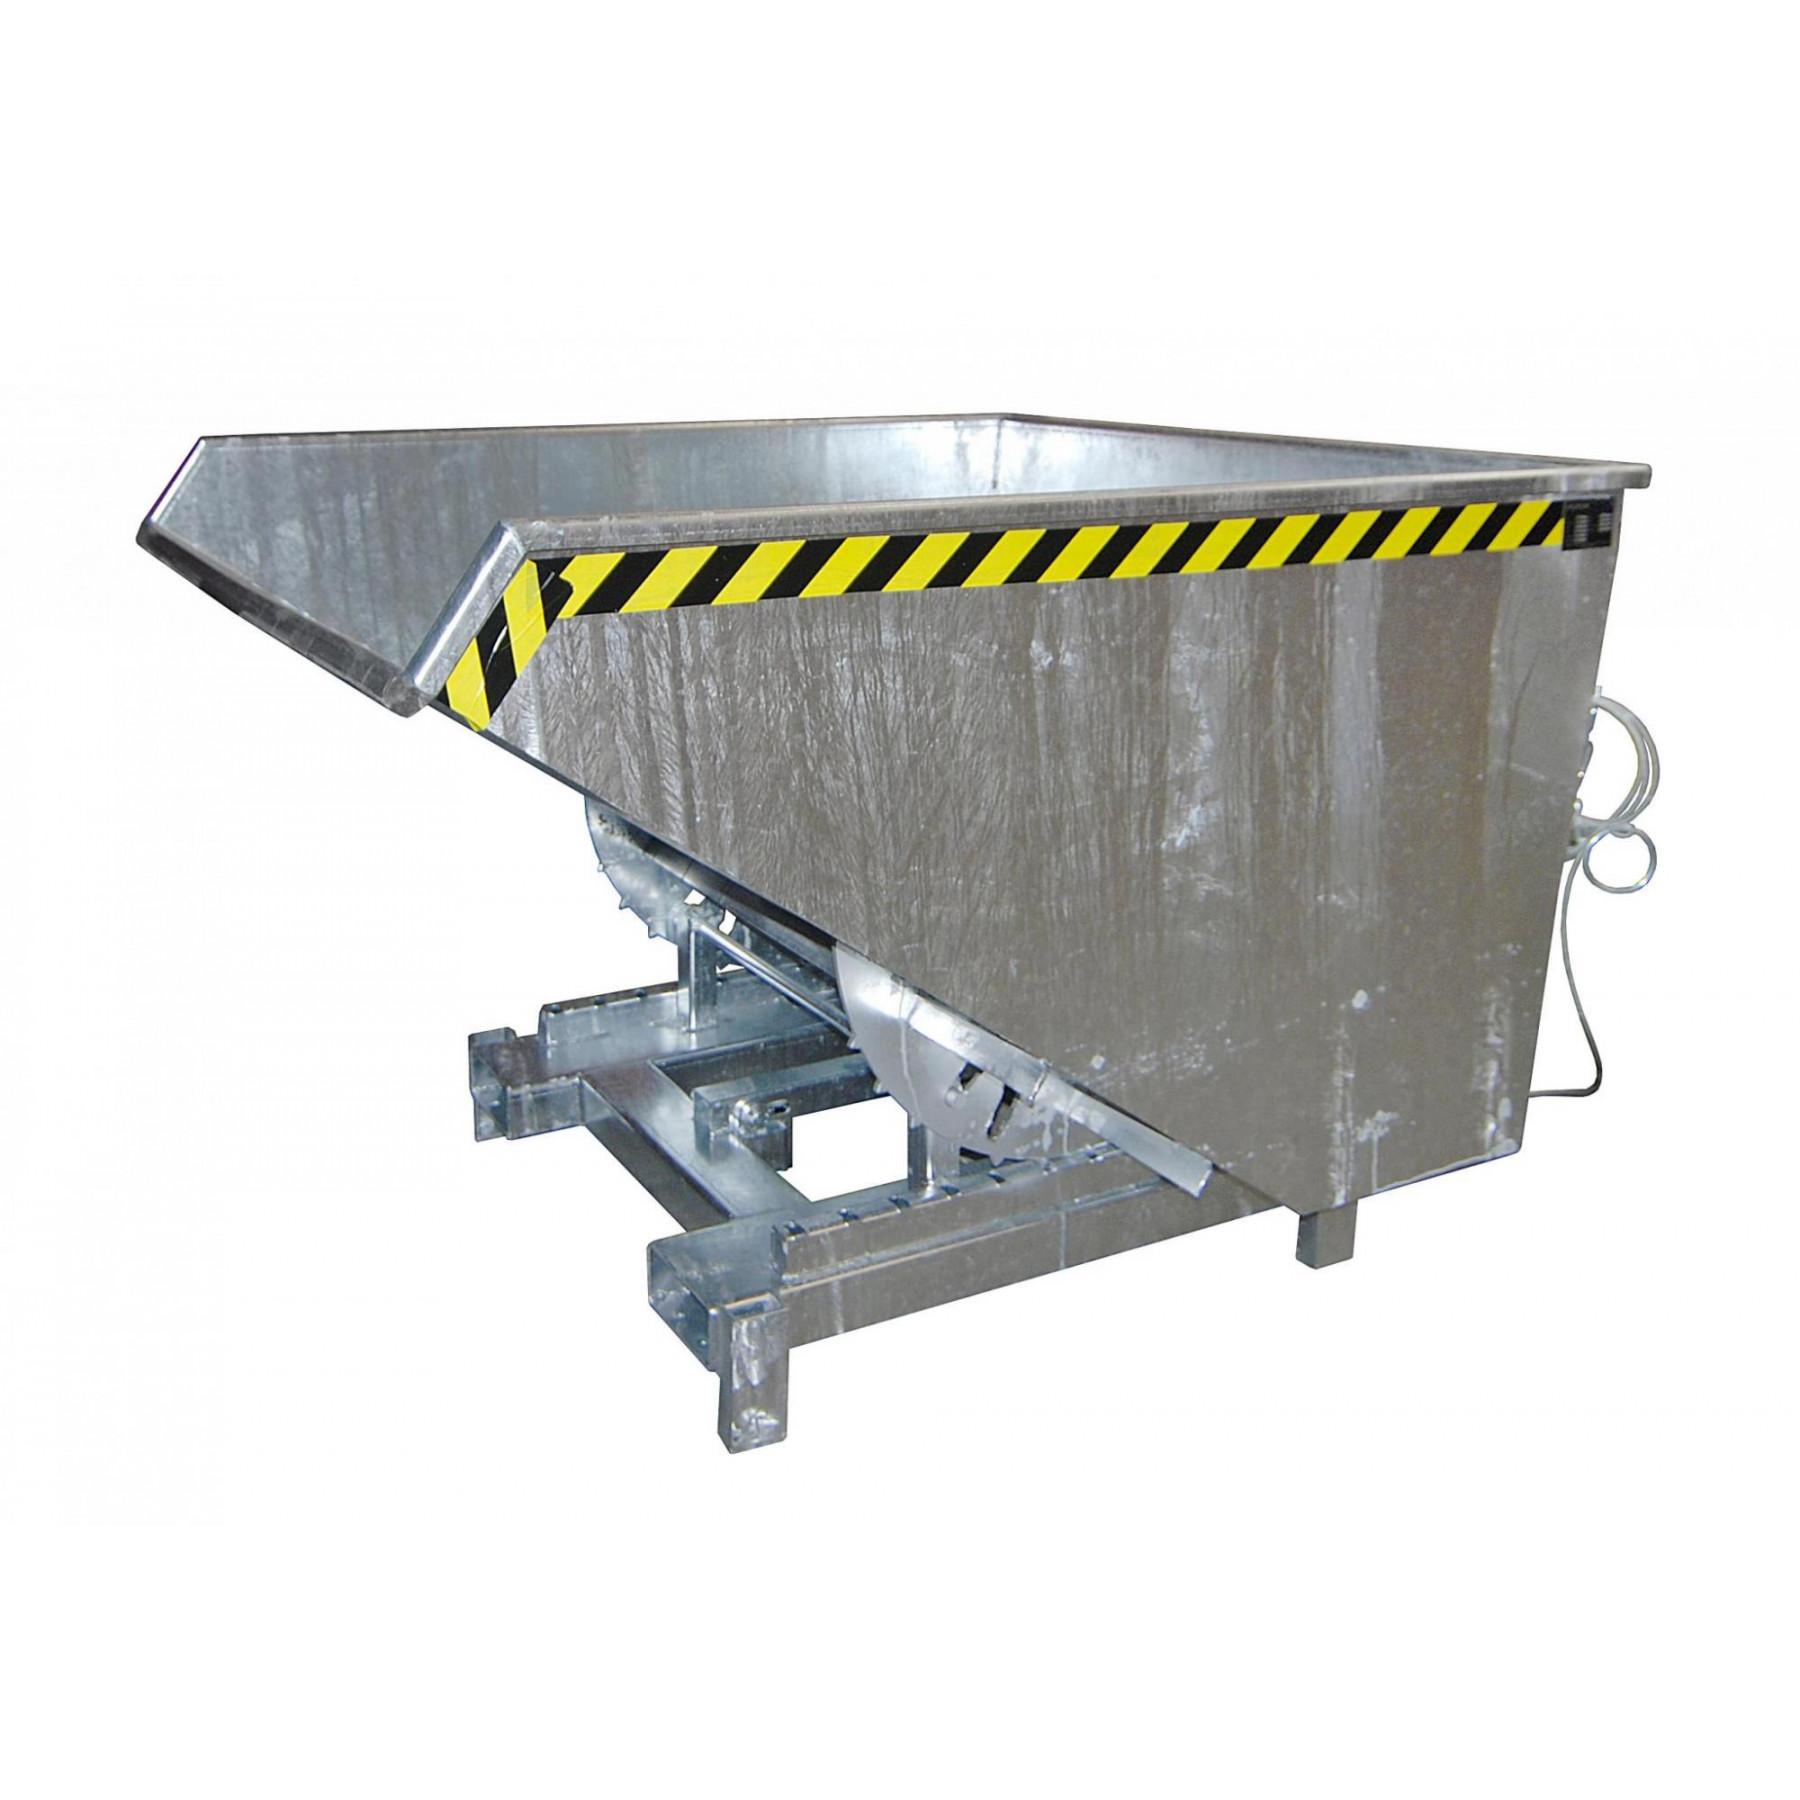 Kiepcontainer extra zwaar 900 liter, MTF-SK-900-V